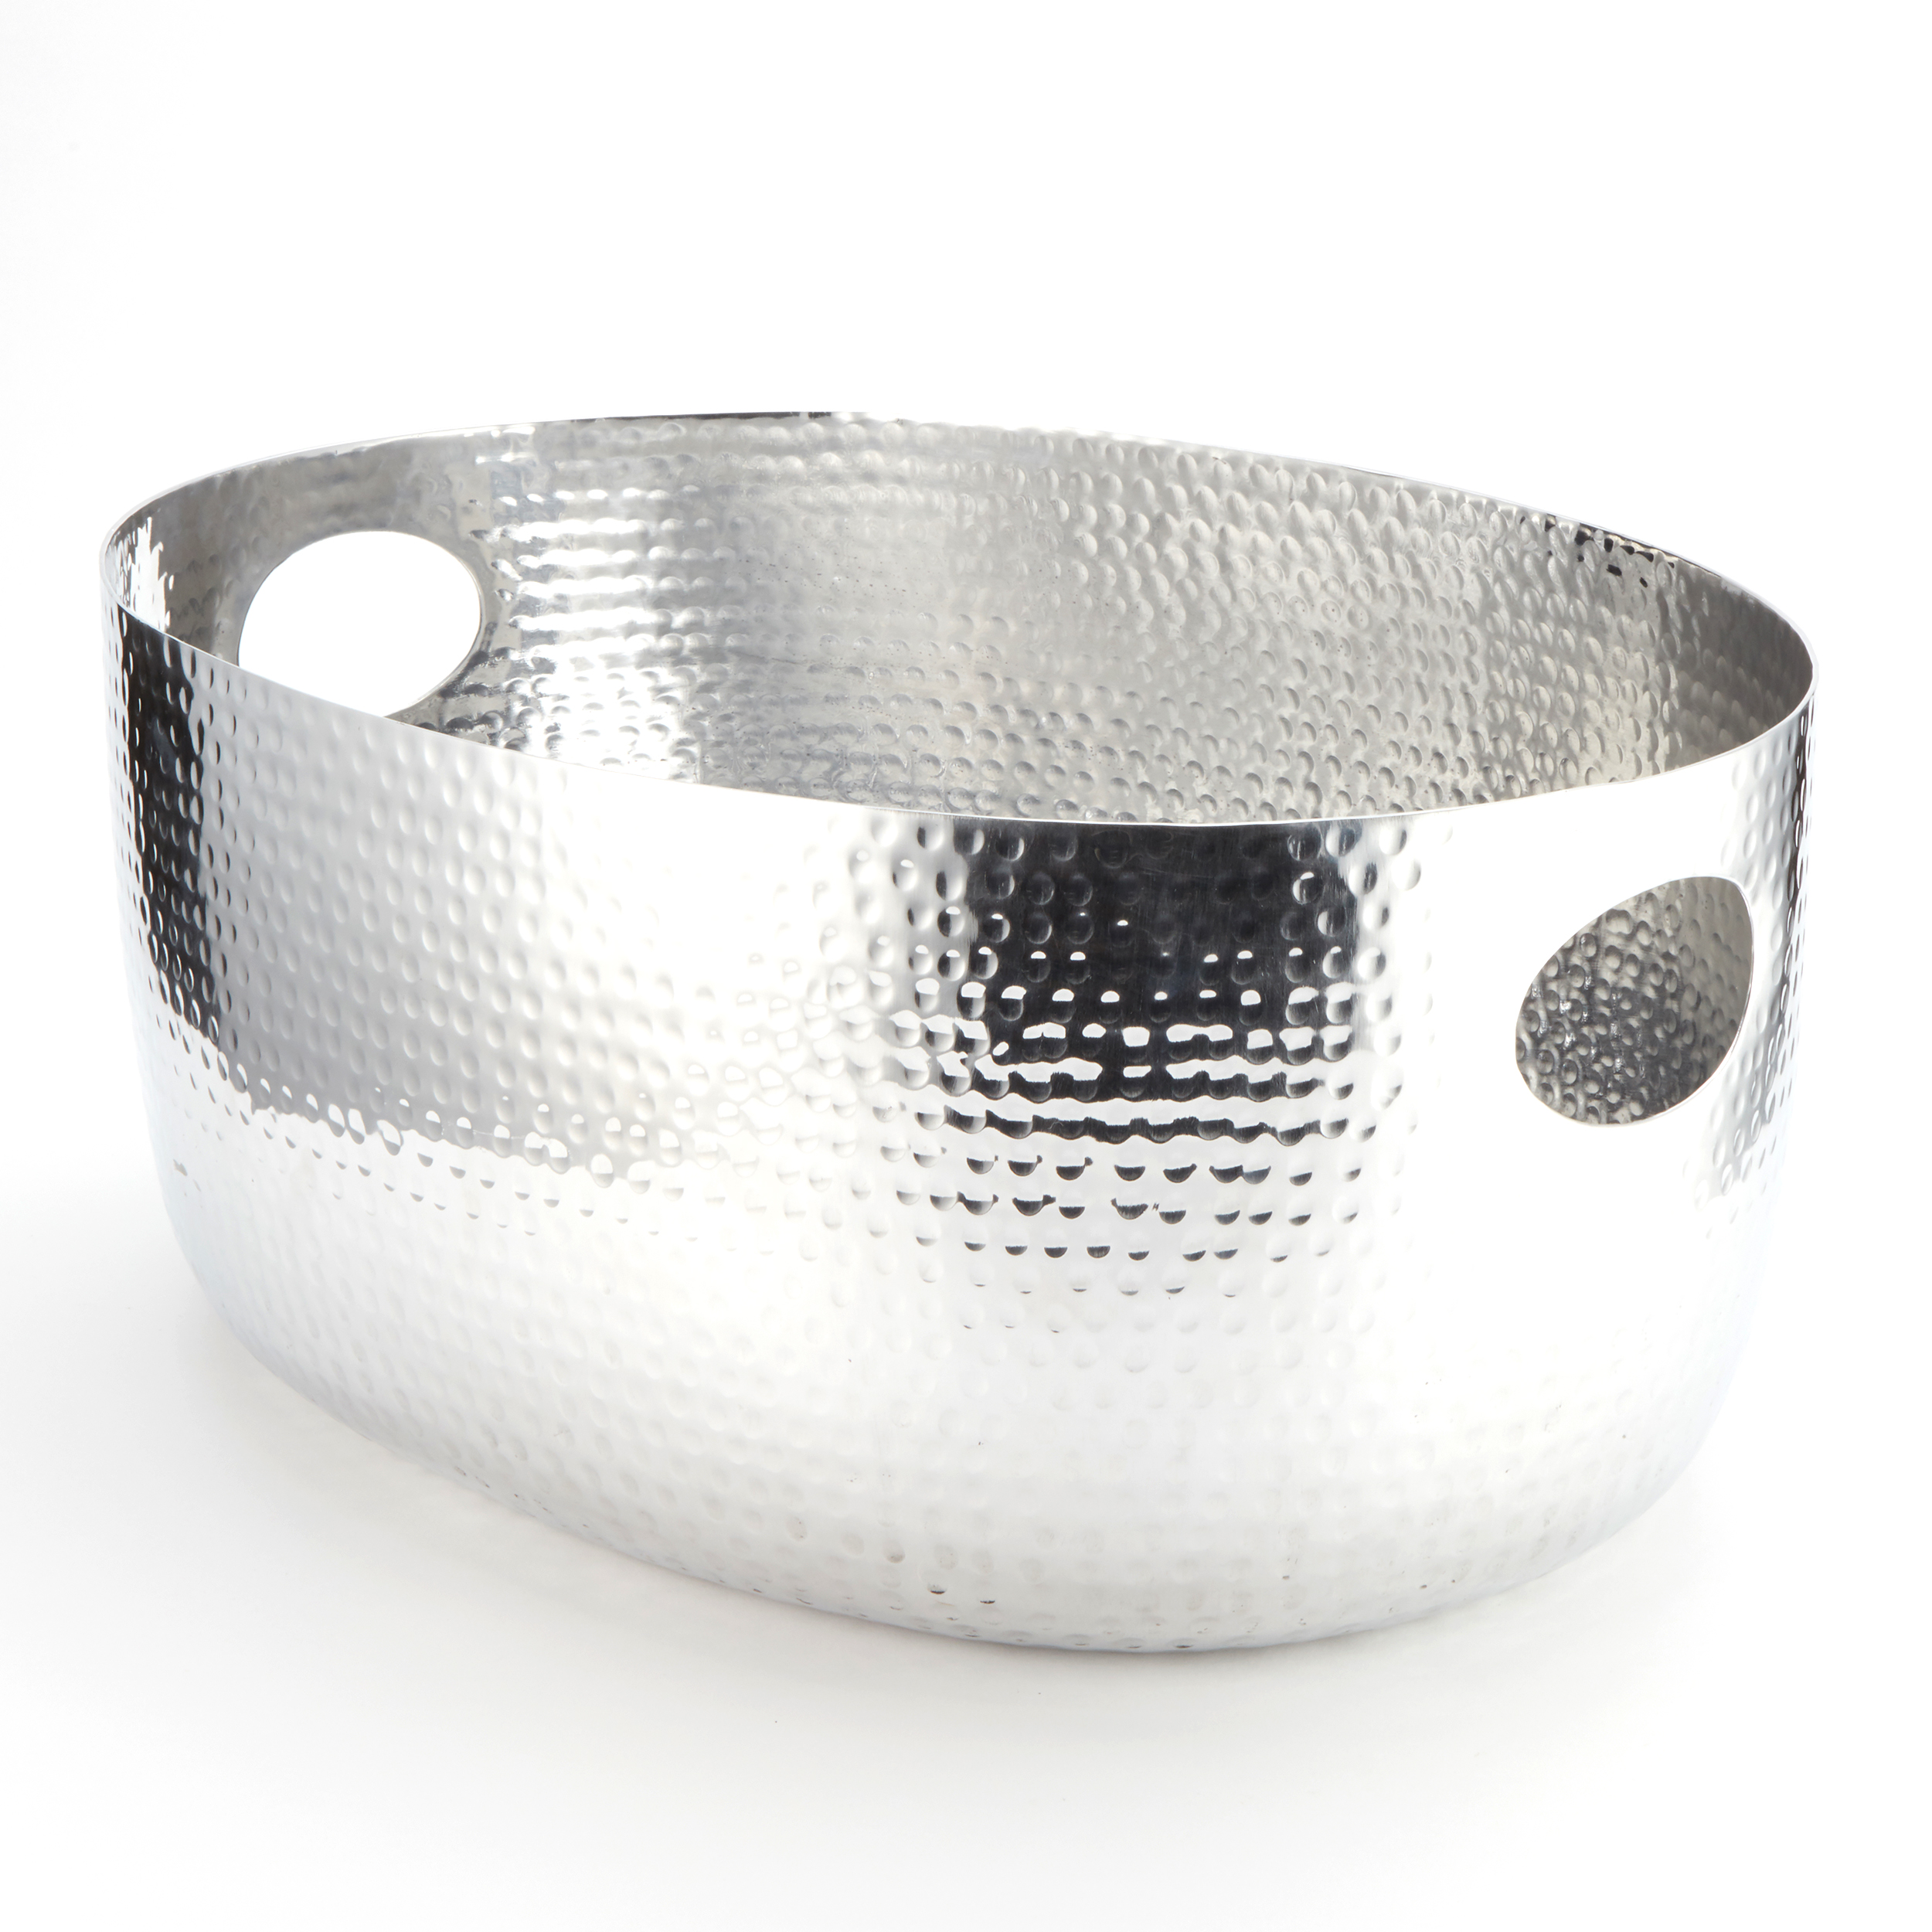 American Metalcraft ATHS14 beverage / ice tub